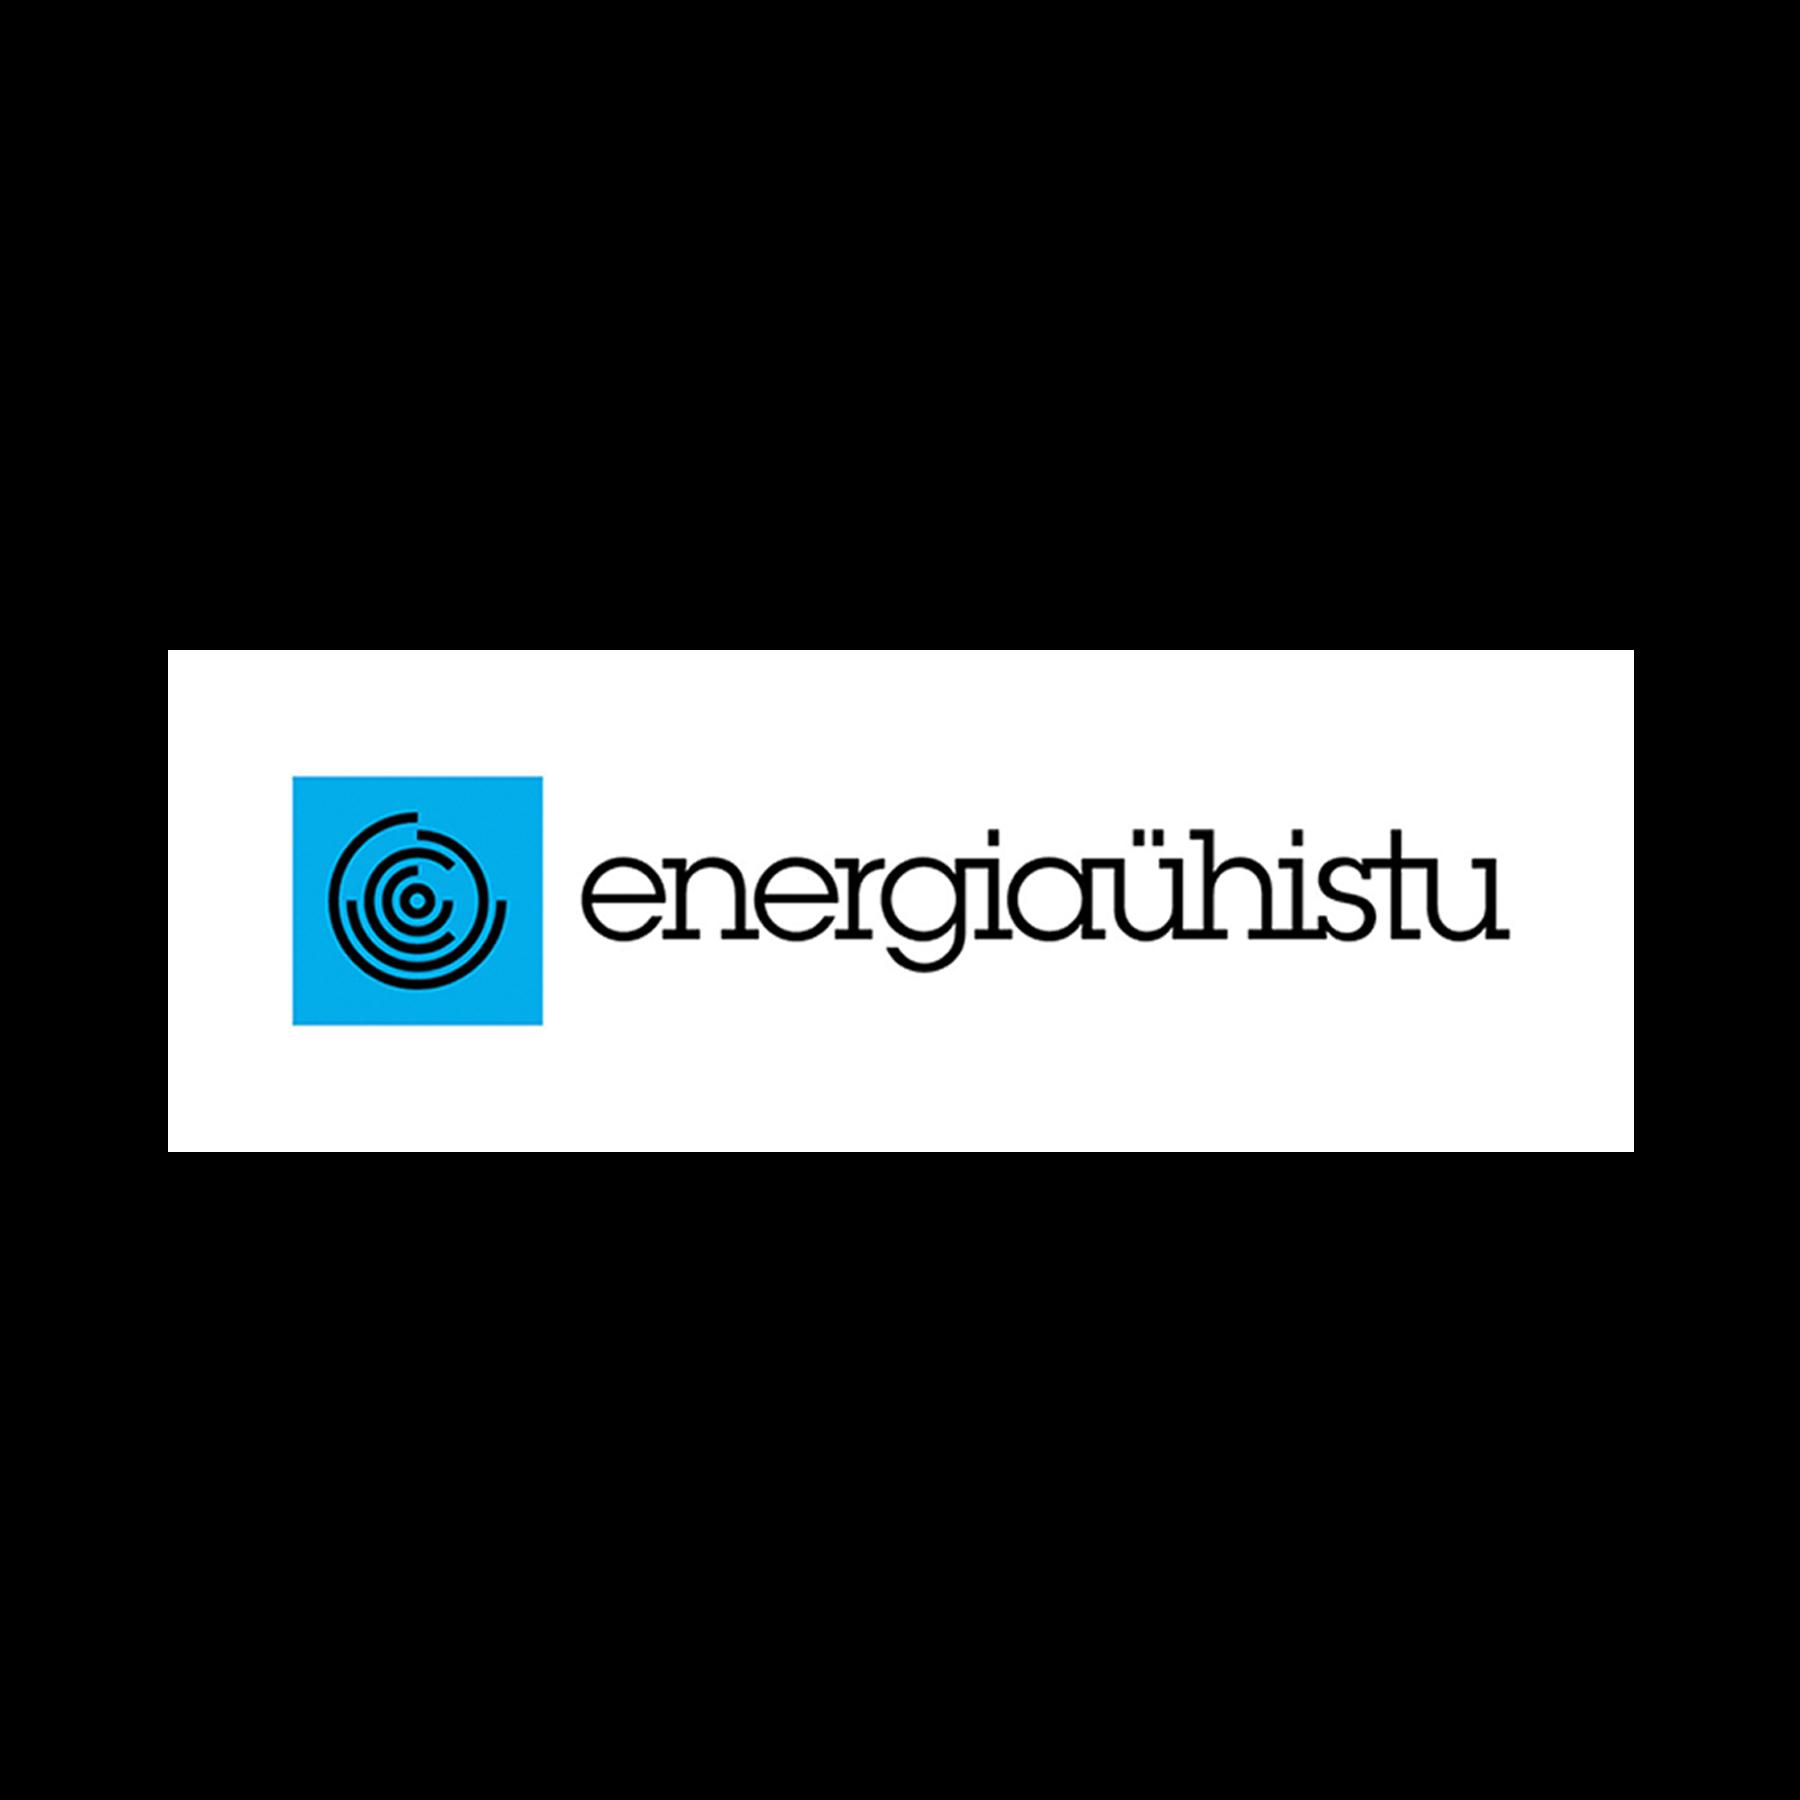 Energiaühistu_1800x1800px